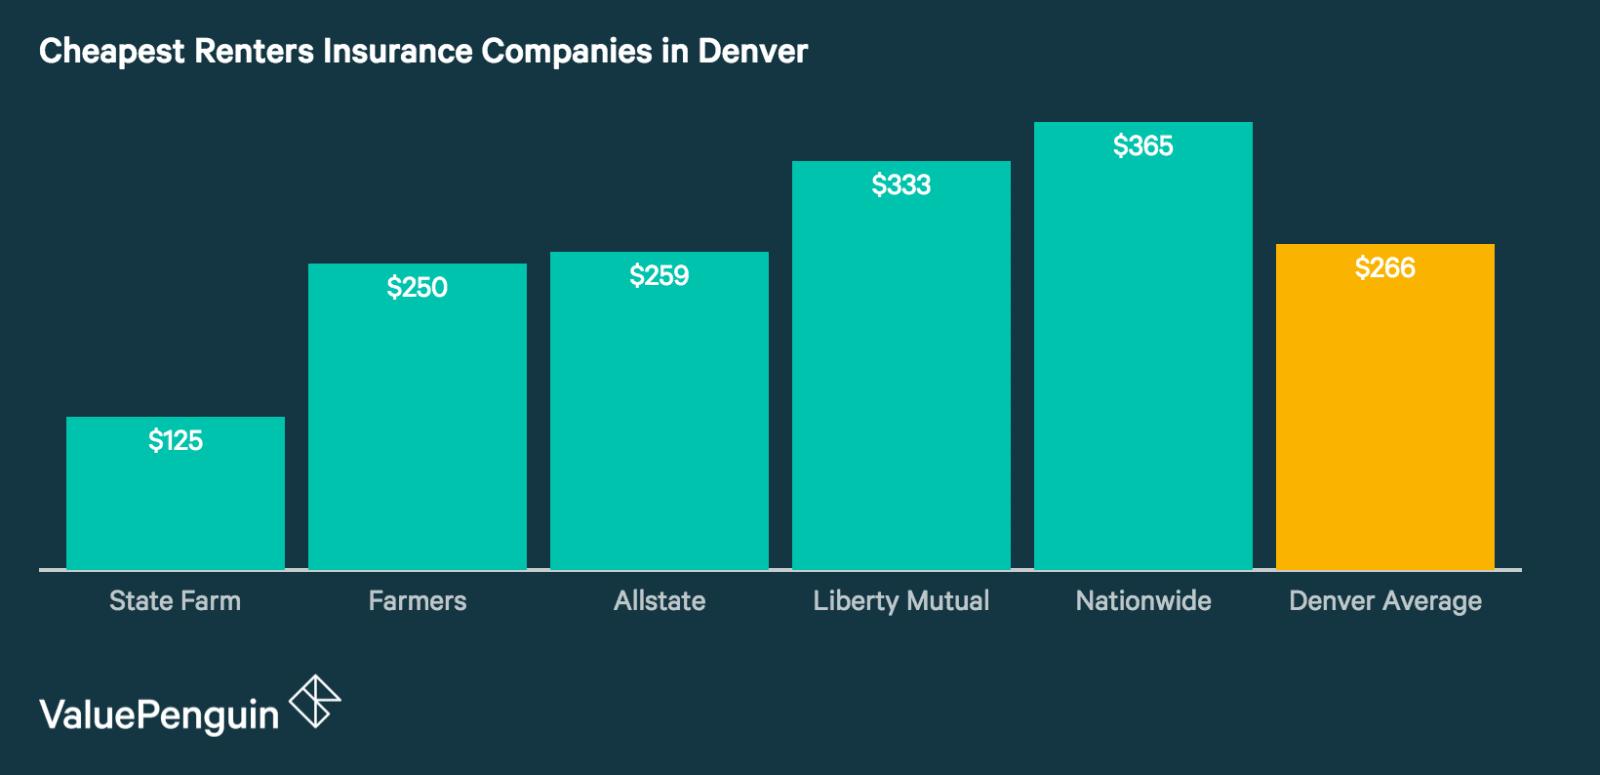 Best Renters Insurance Companies in Denver